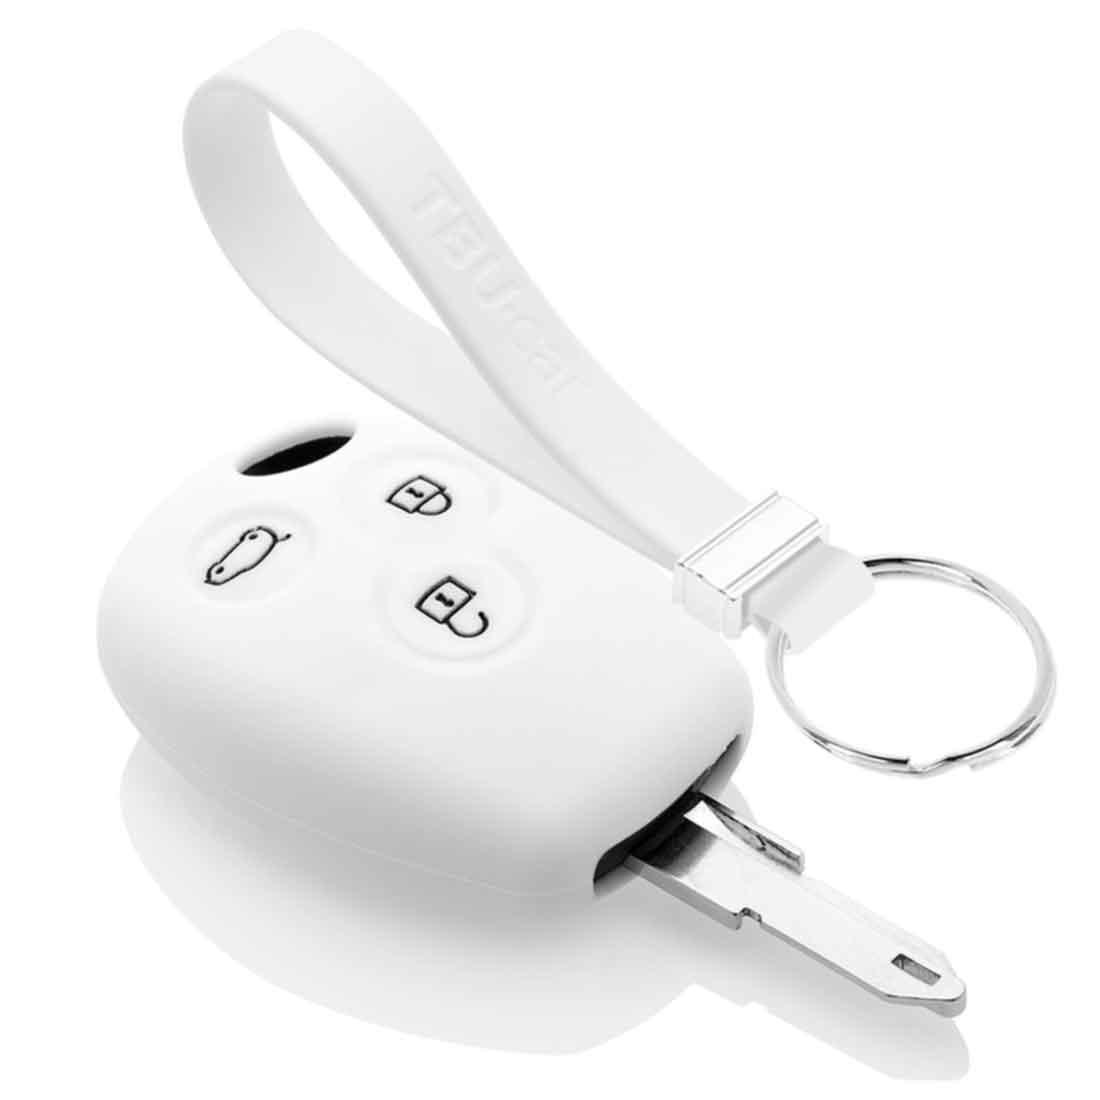 TBU car TBU car Autoschlüssel Hülle kompatibel mit Dacia 3 Tasten - Schutzhülle aus Silikon - Auto Schlüsselhülle Cover in Weiß